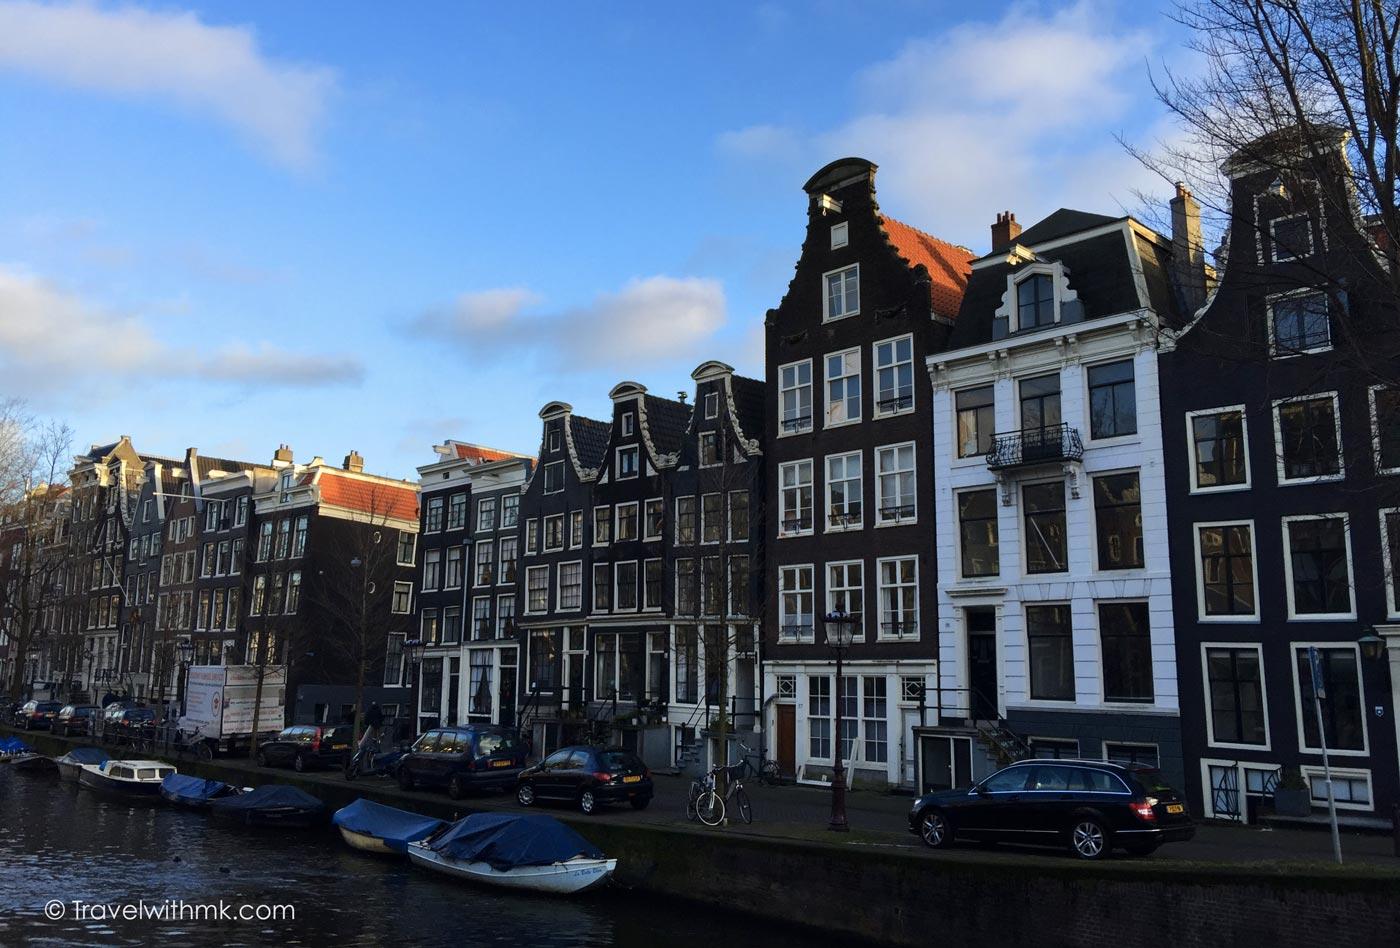 Strolling through Amsterdam © Travelwithmk.com